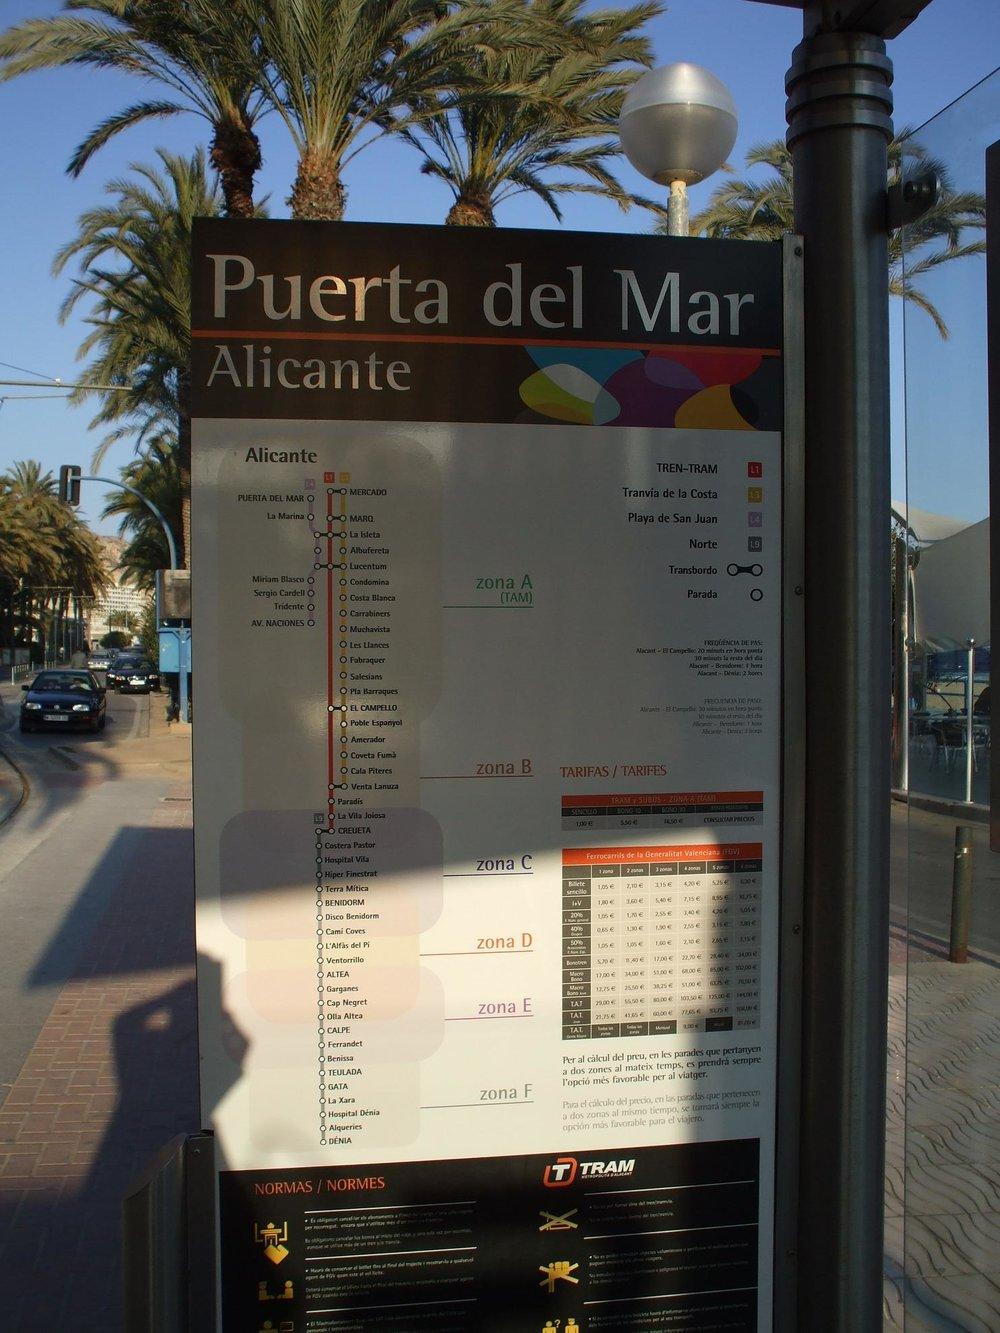 Puerta del Mar, 28. 1. 2008 (4).JPG